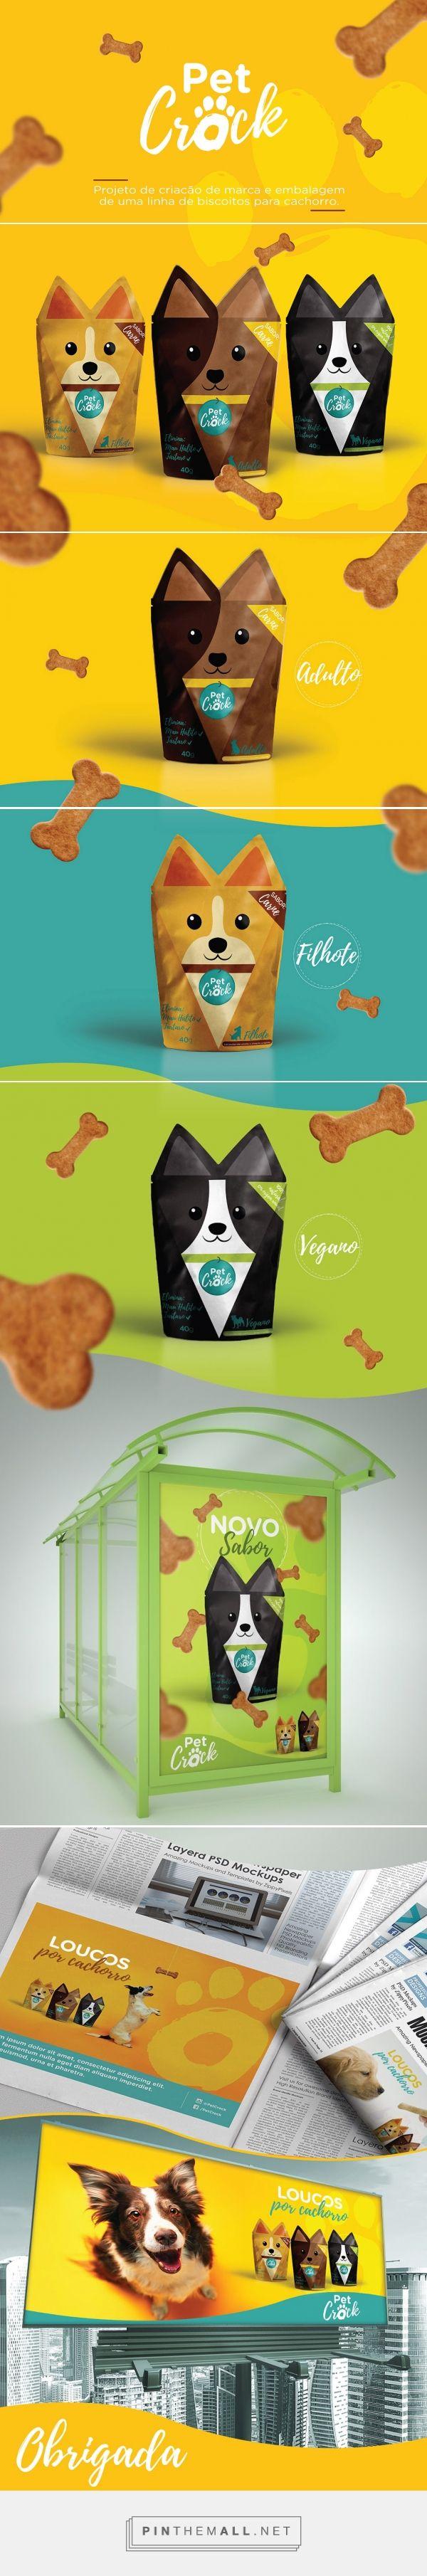 Pet Crock dog cookie packaging design concept by Jessica Santos (Brazil) - http://www.packagingoftheworld.com/2016/09/pet-crock-concept.html